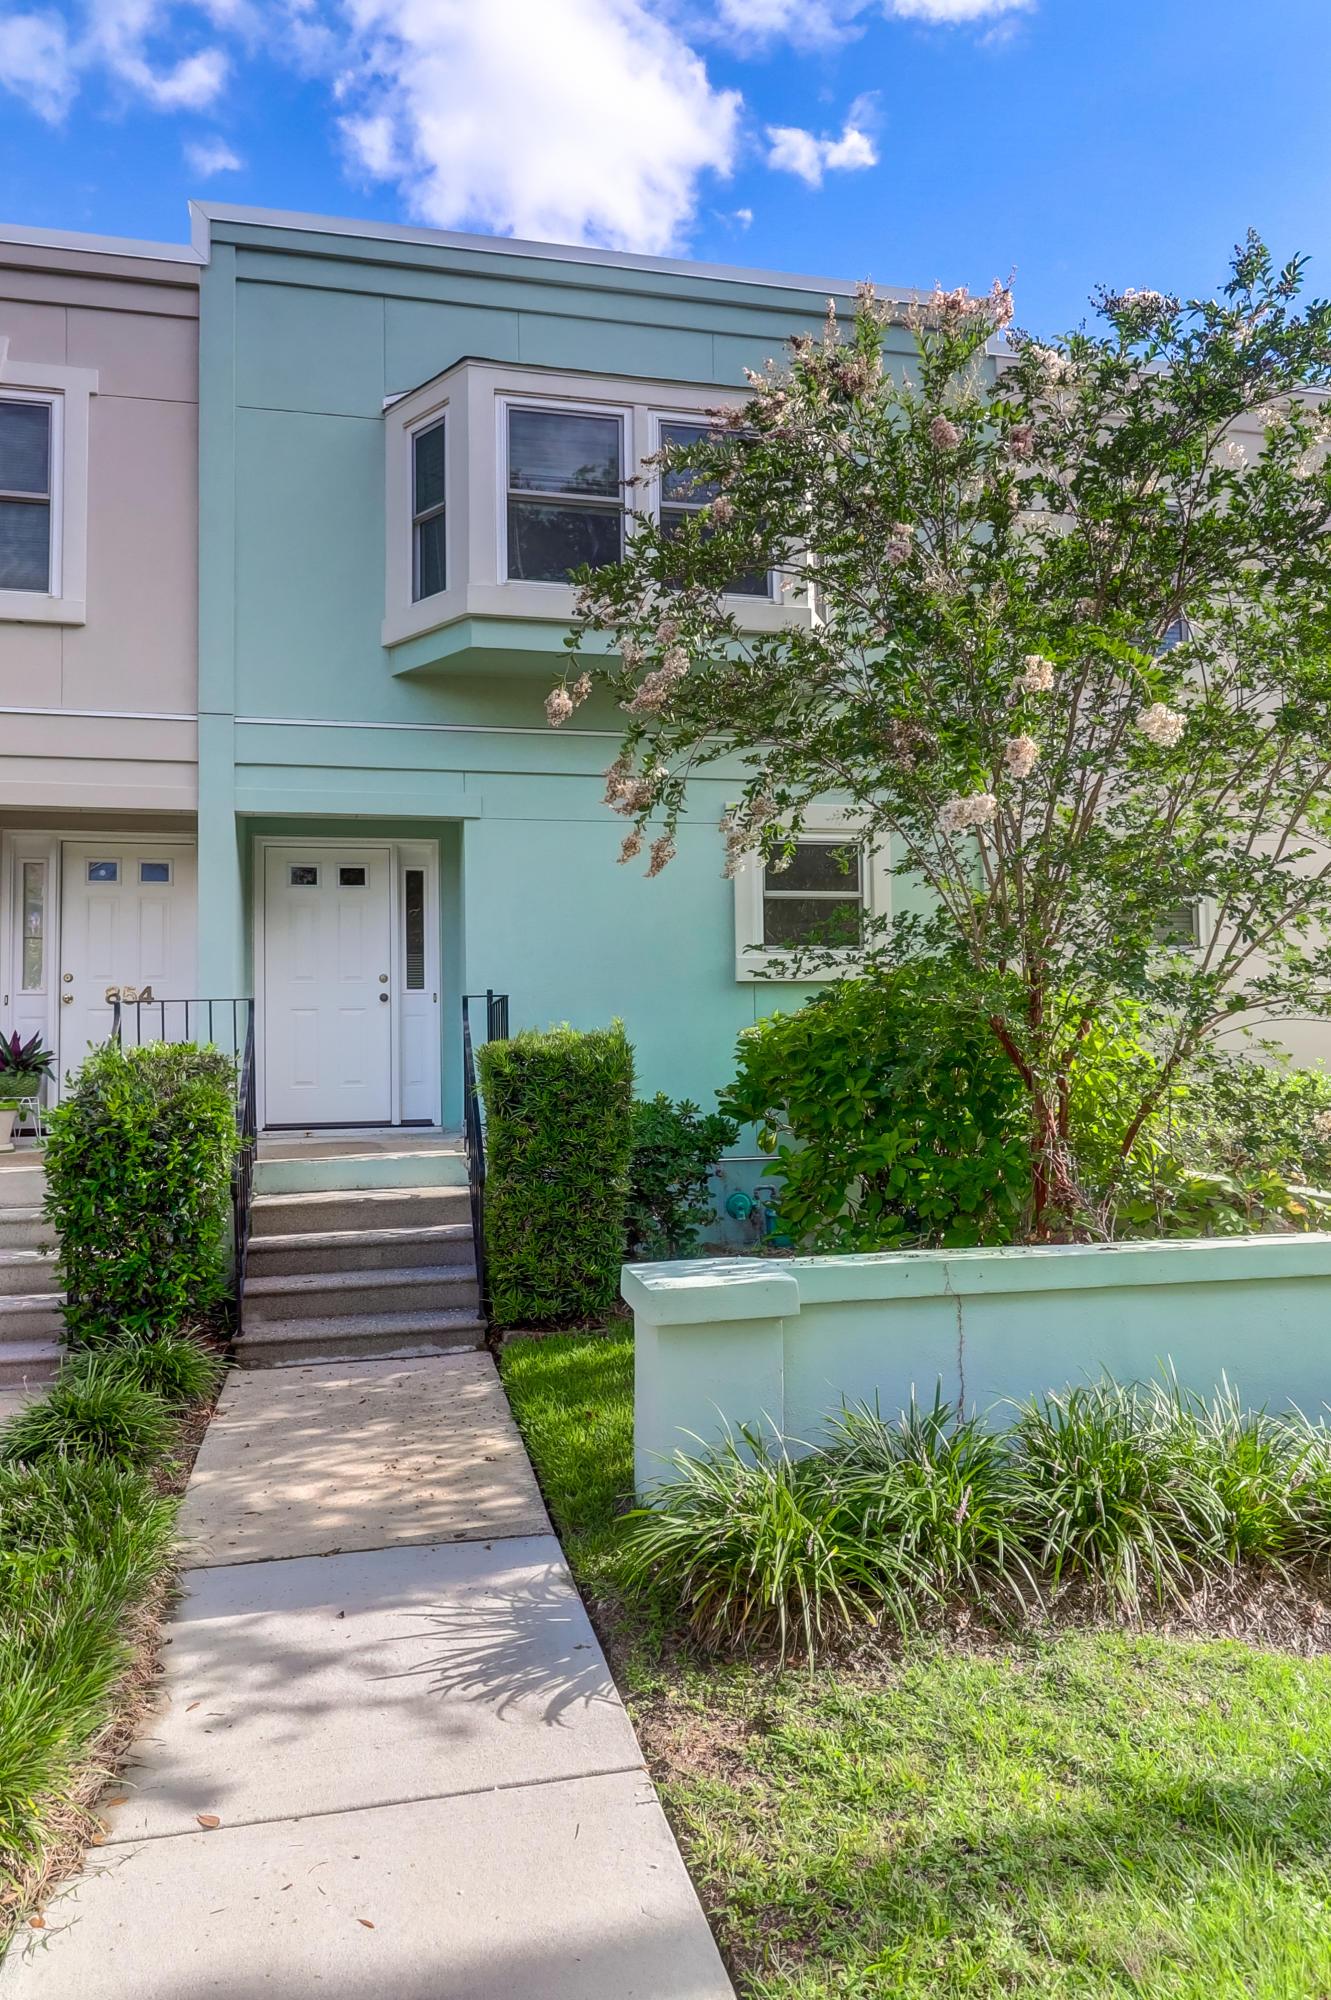 Proprietors Row Homes For Sale - 852 Colony, Charleston, SC - 22